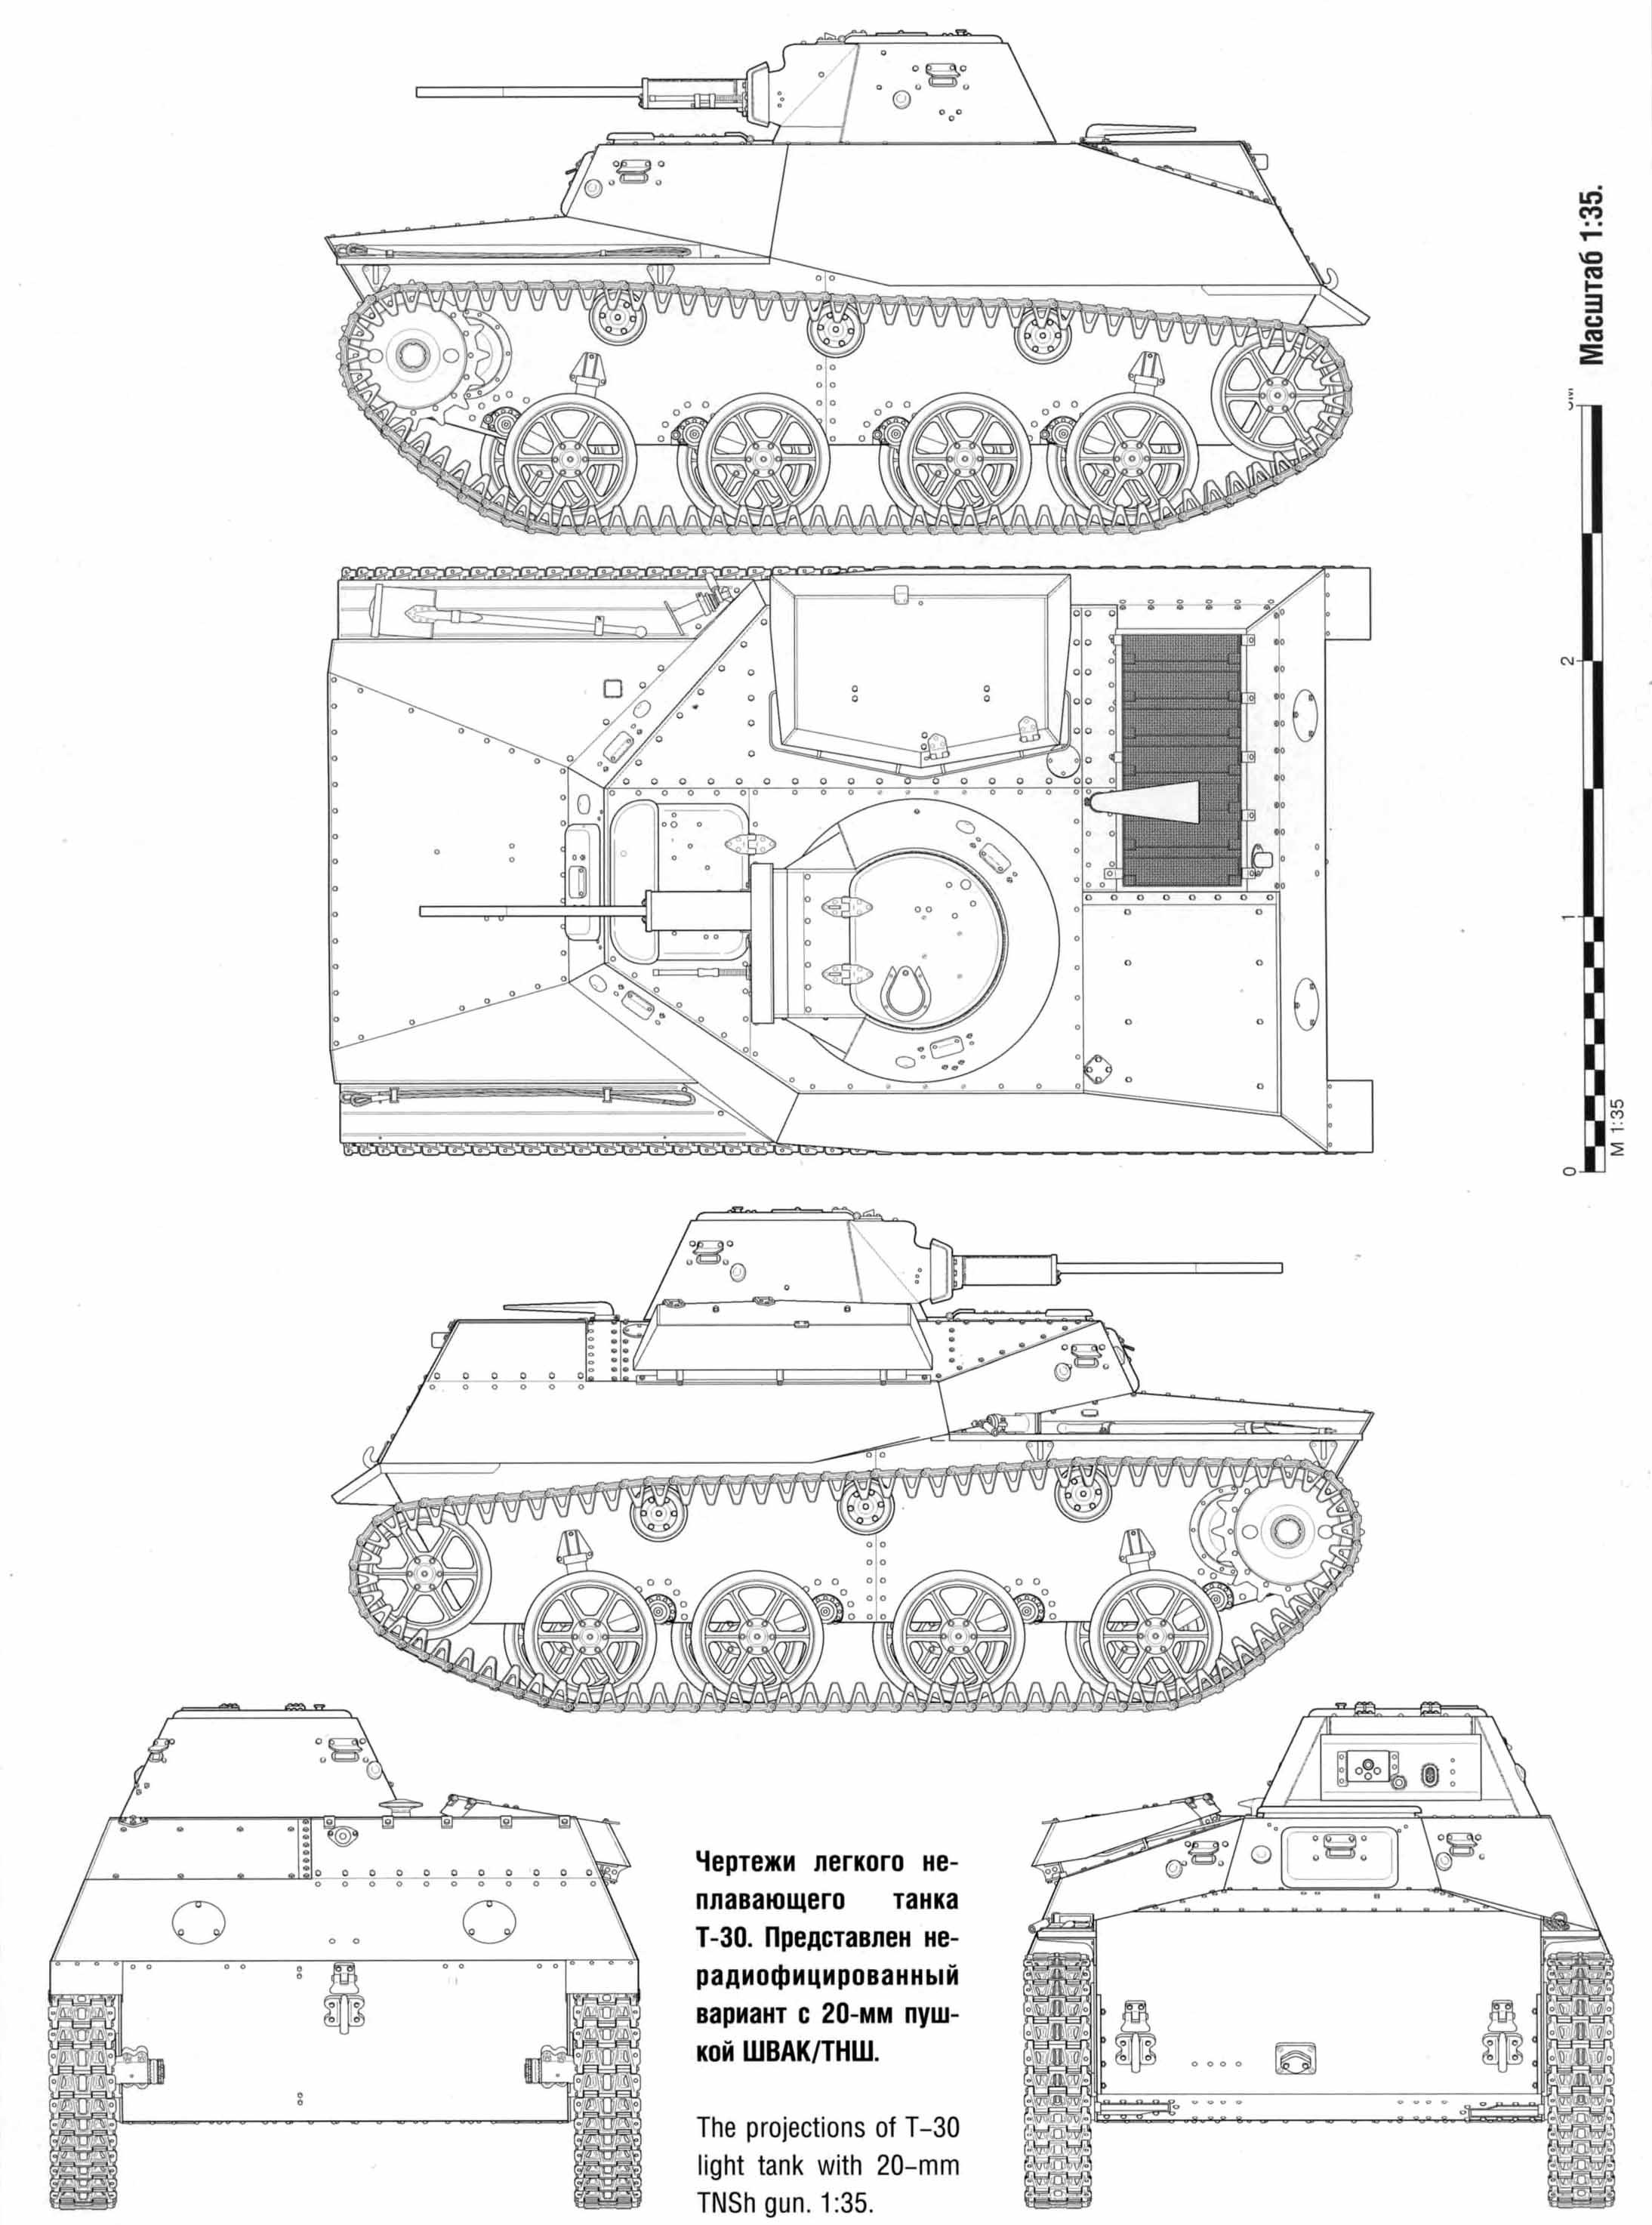 Чертежи легкого танка т 30 обр 1941 года с